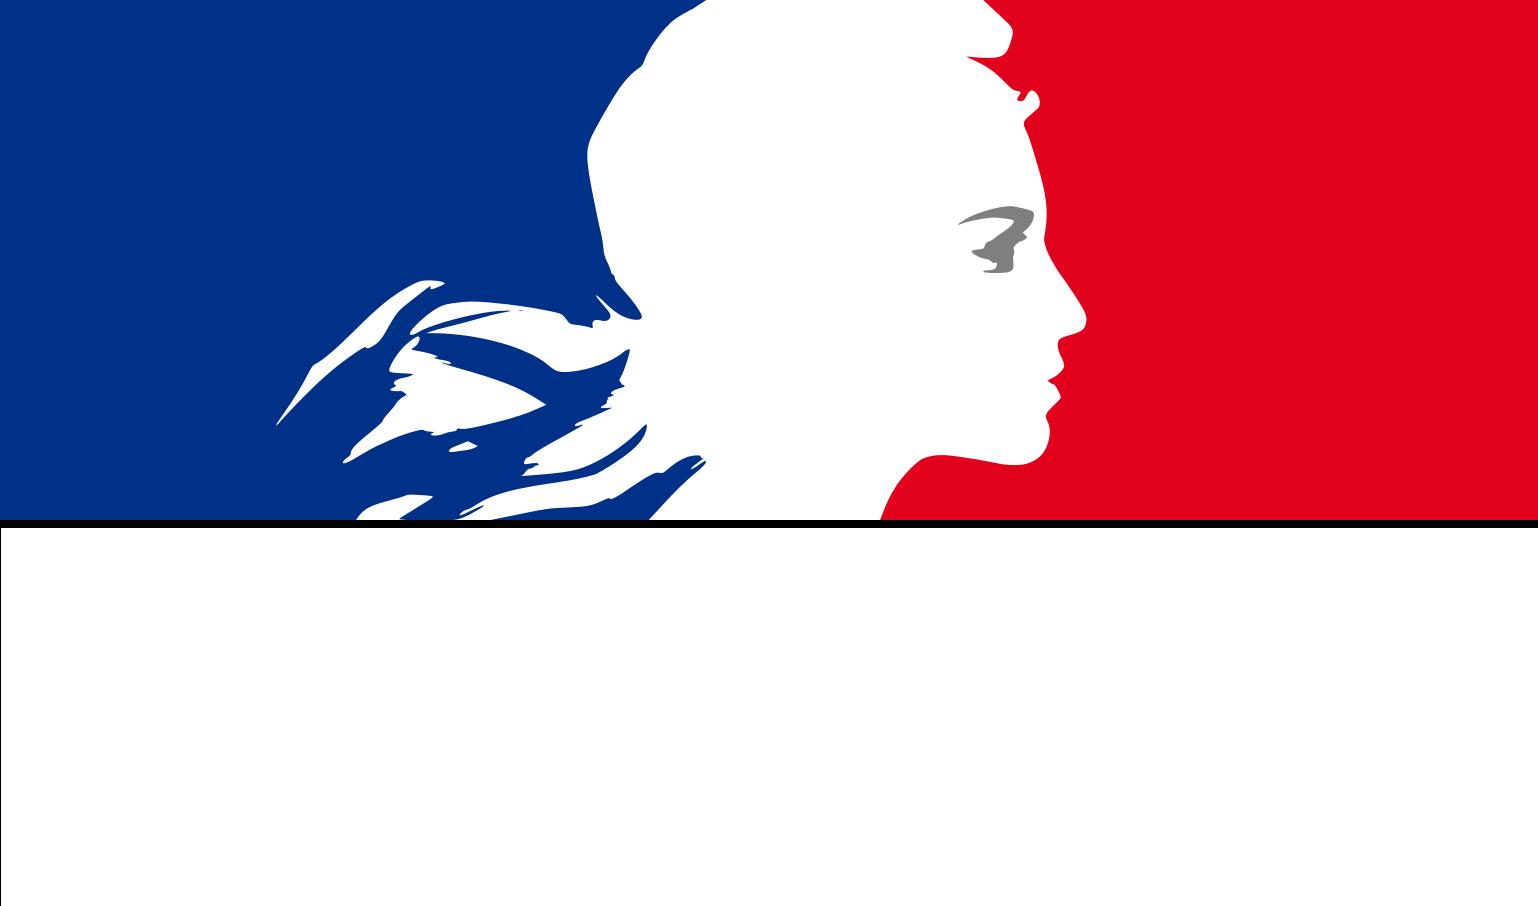 Ambassade france tunisie rendez vous dating 3